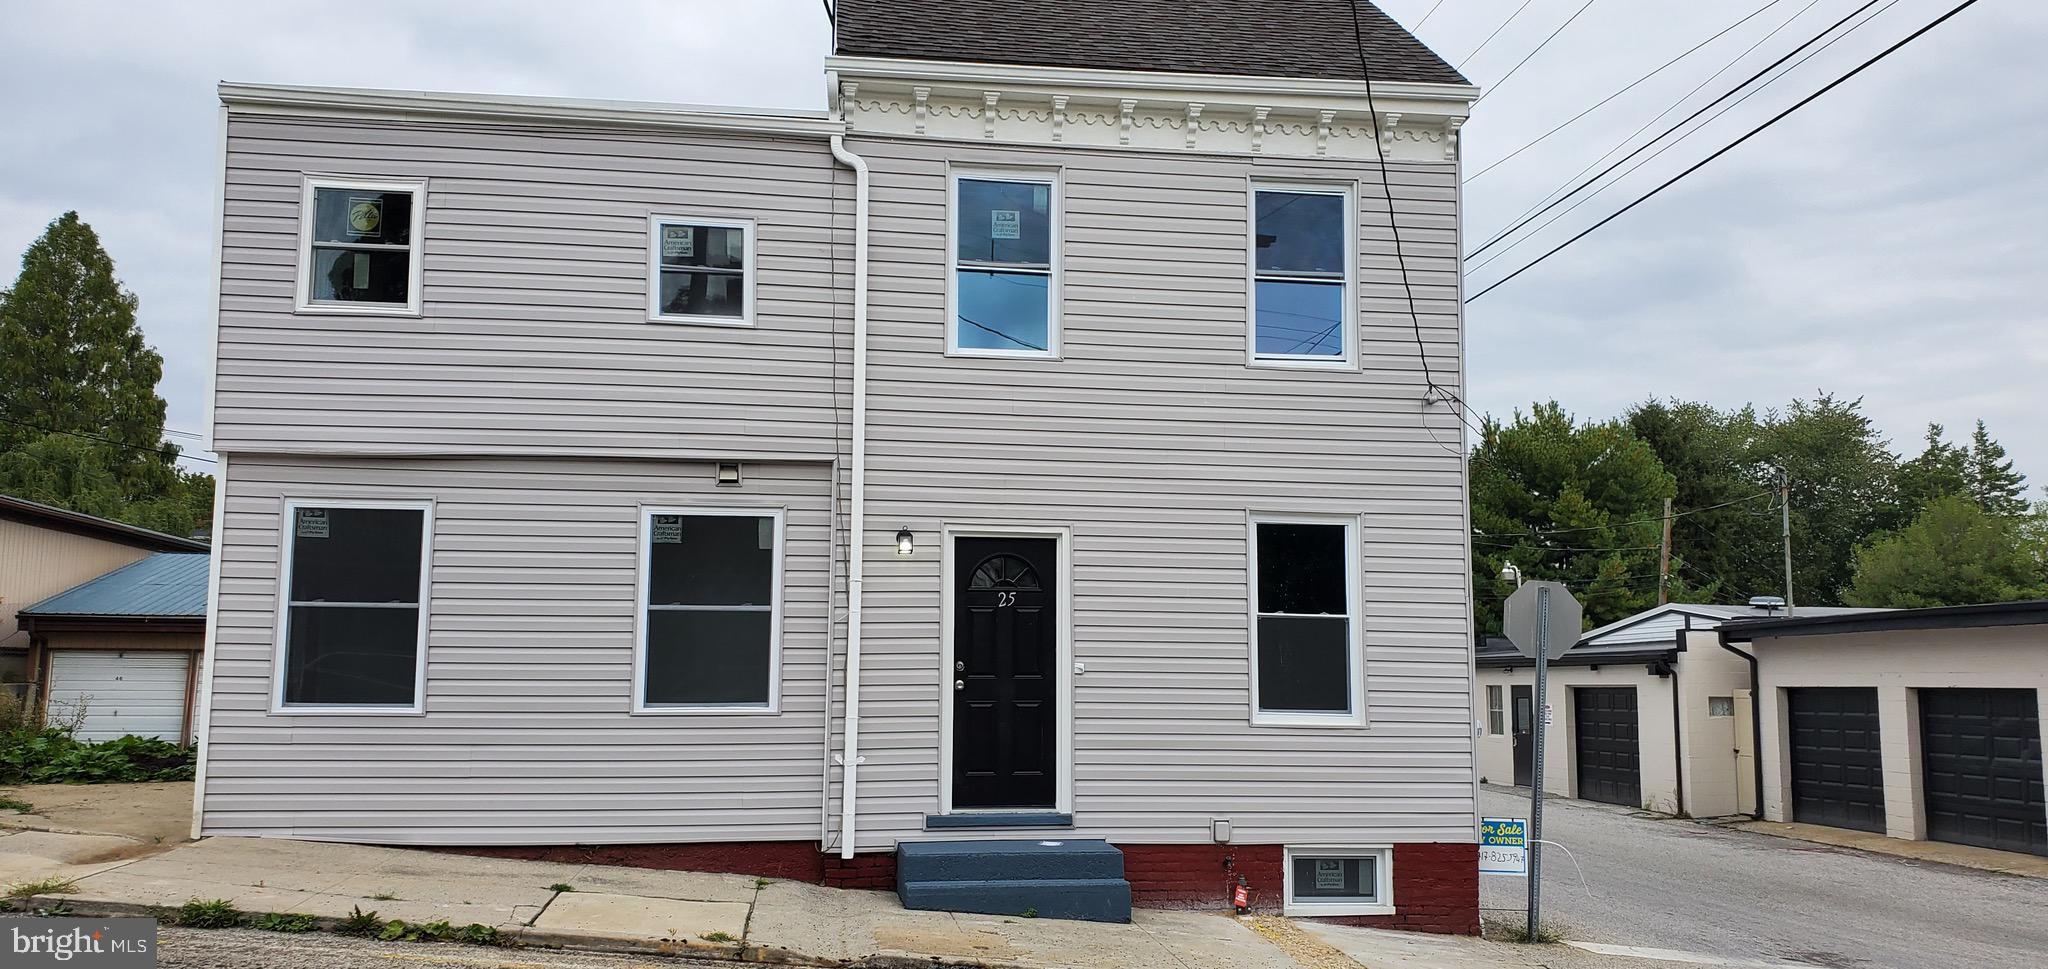 25 S Albemarle, York, PA 17403